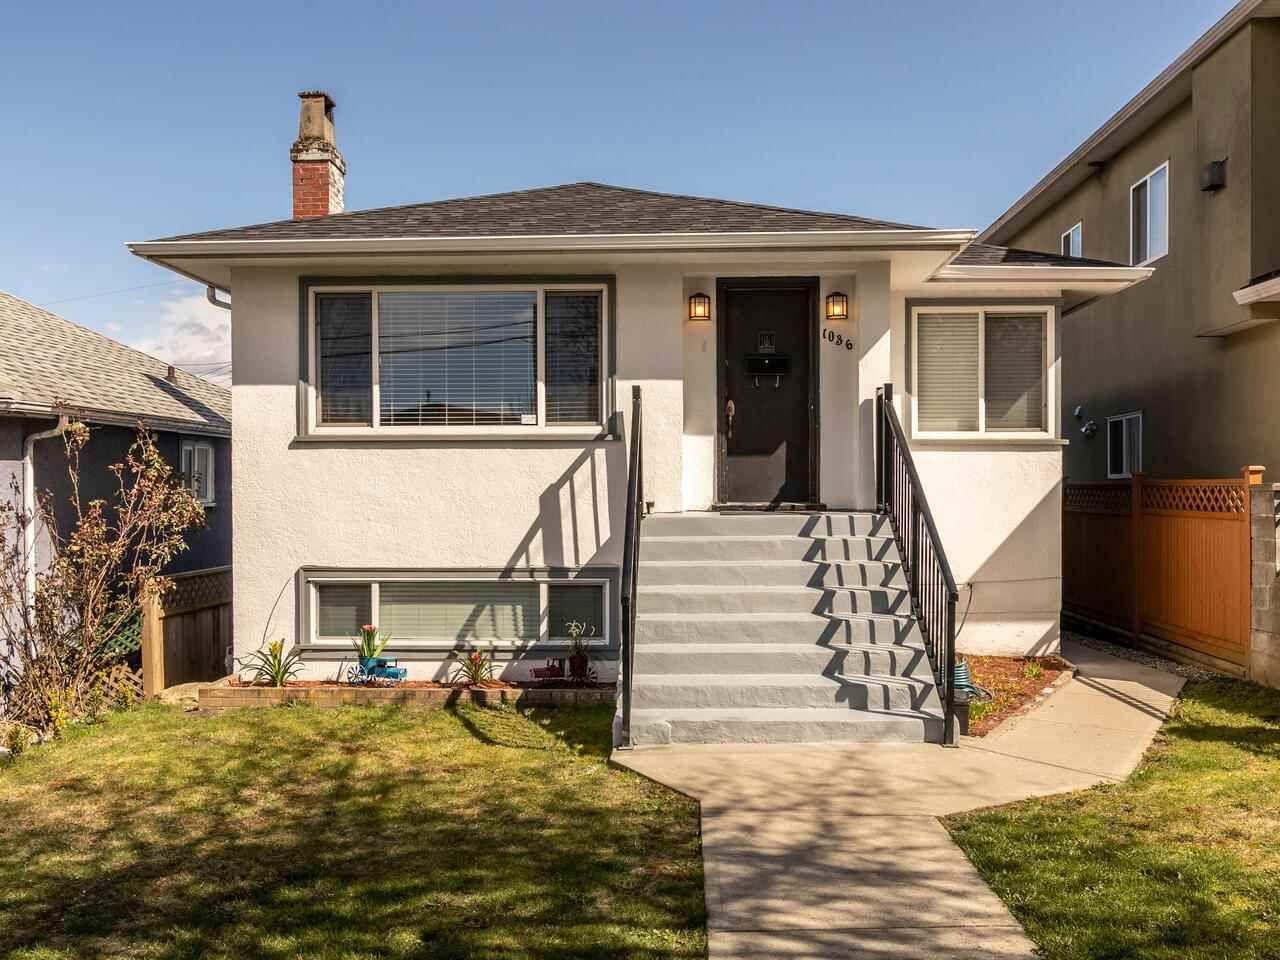 Main Photo: 1036 NOOTKA Street in Vancouver: Renfrew VE House for sale (Vancouver East)  : MLS®# R2560660